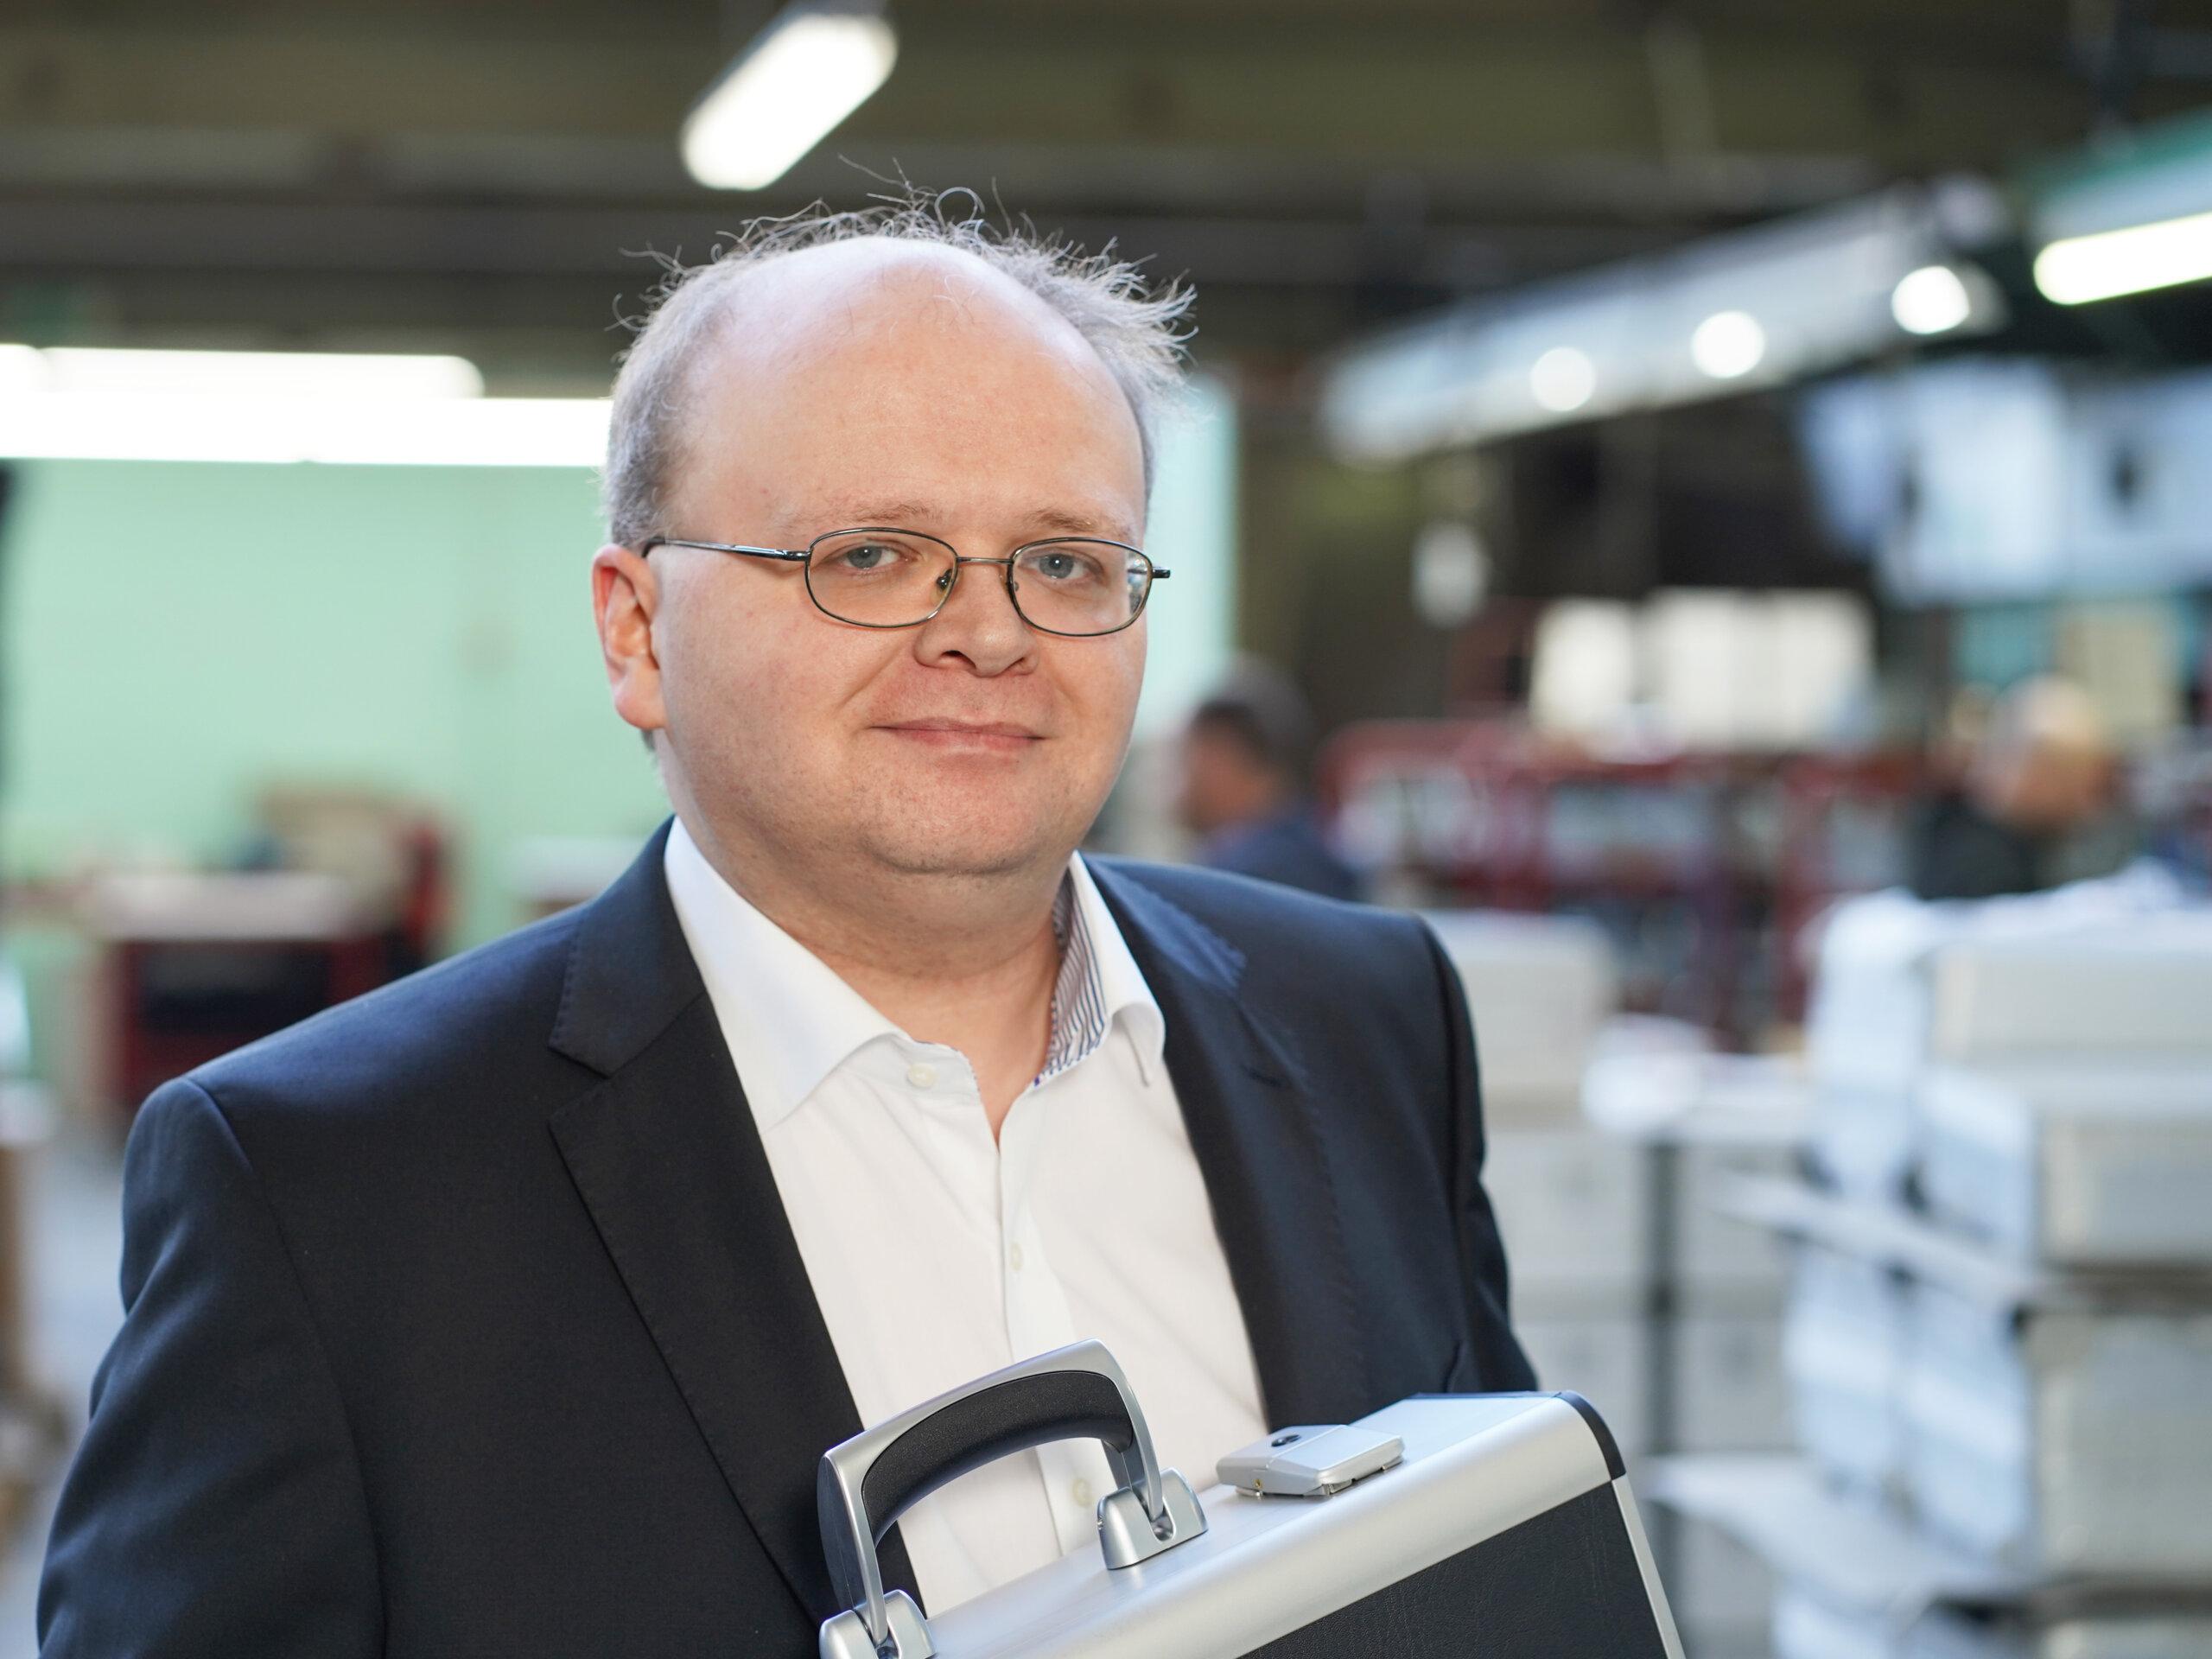 Andreas Rehr